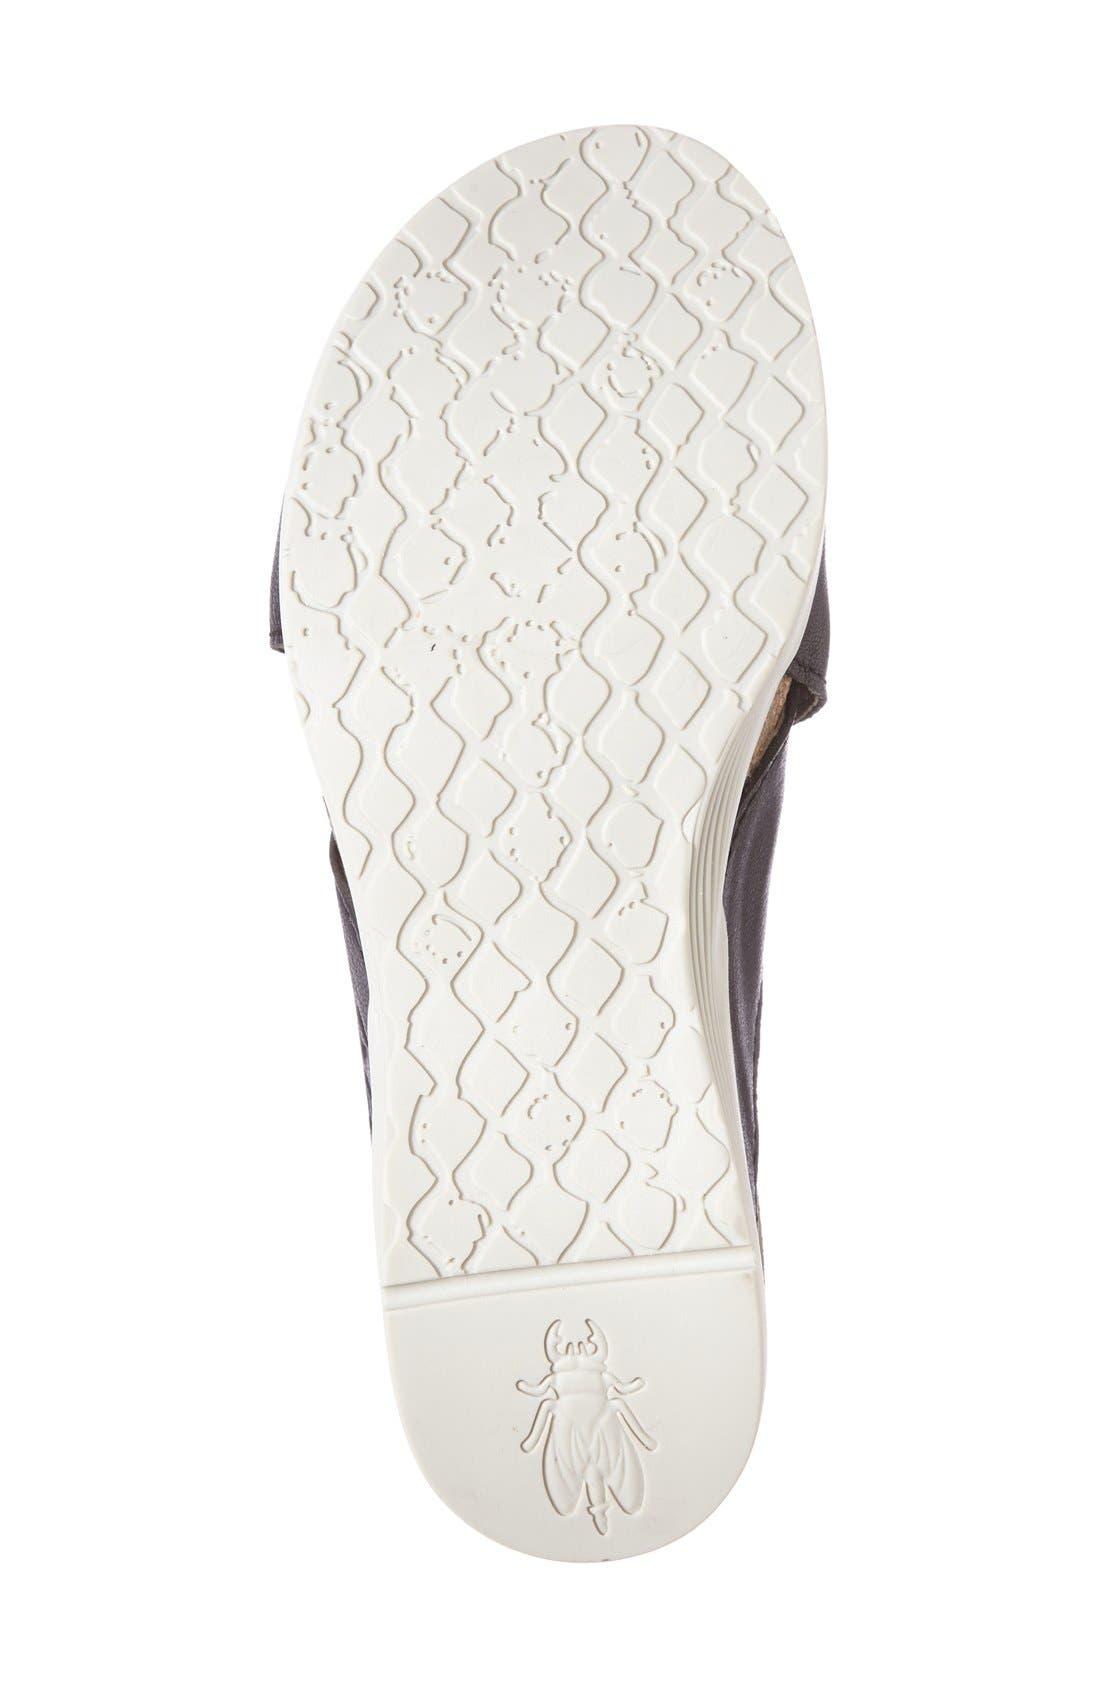 Wary Platform Sandal,                             Alternate thumbnail 8, color,                             001